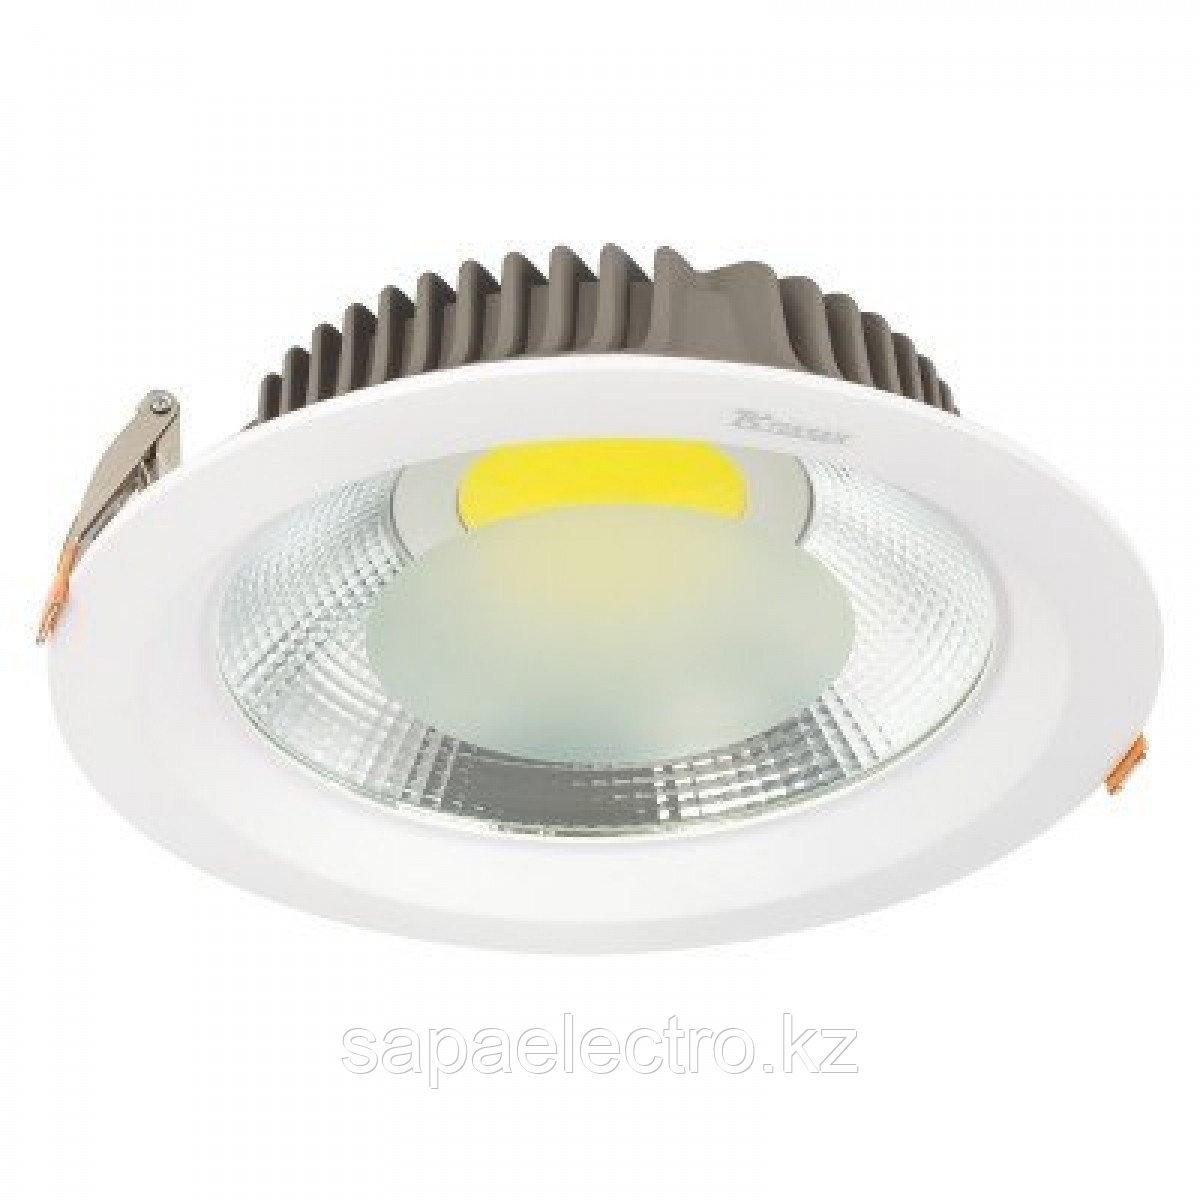 Свет-к DOWNLIGHT LED COB 20W SILVER 5000K (TS) 30шт